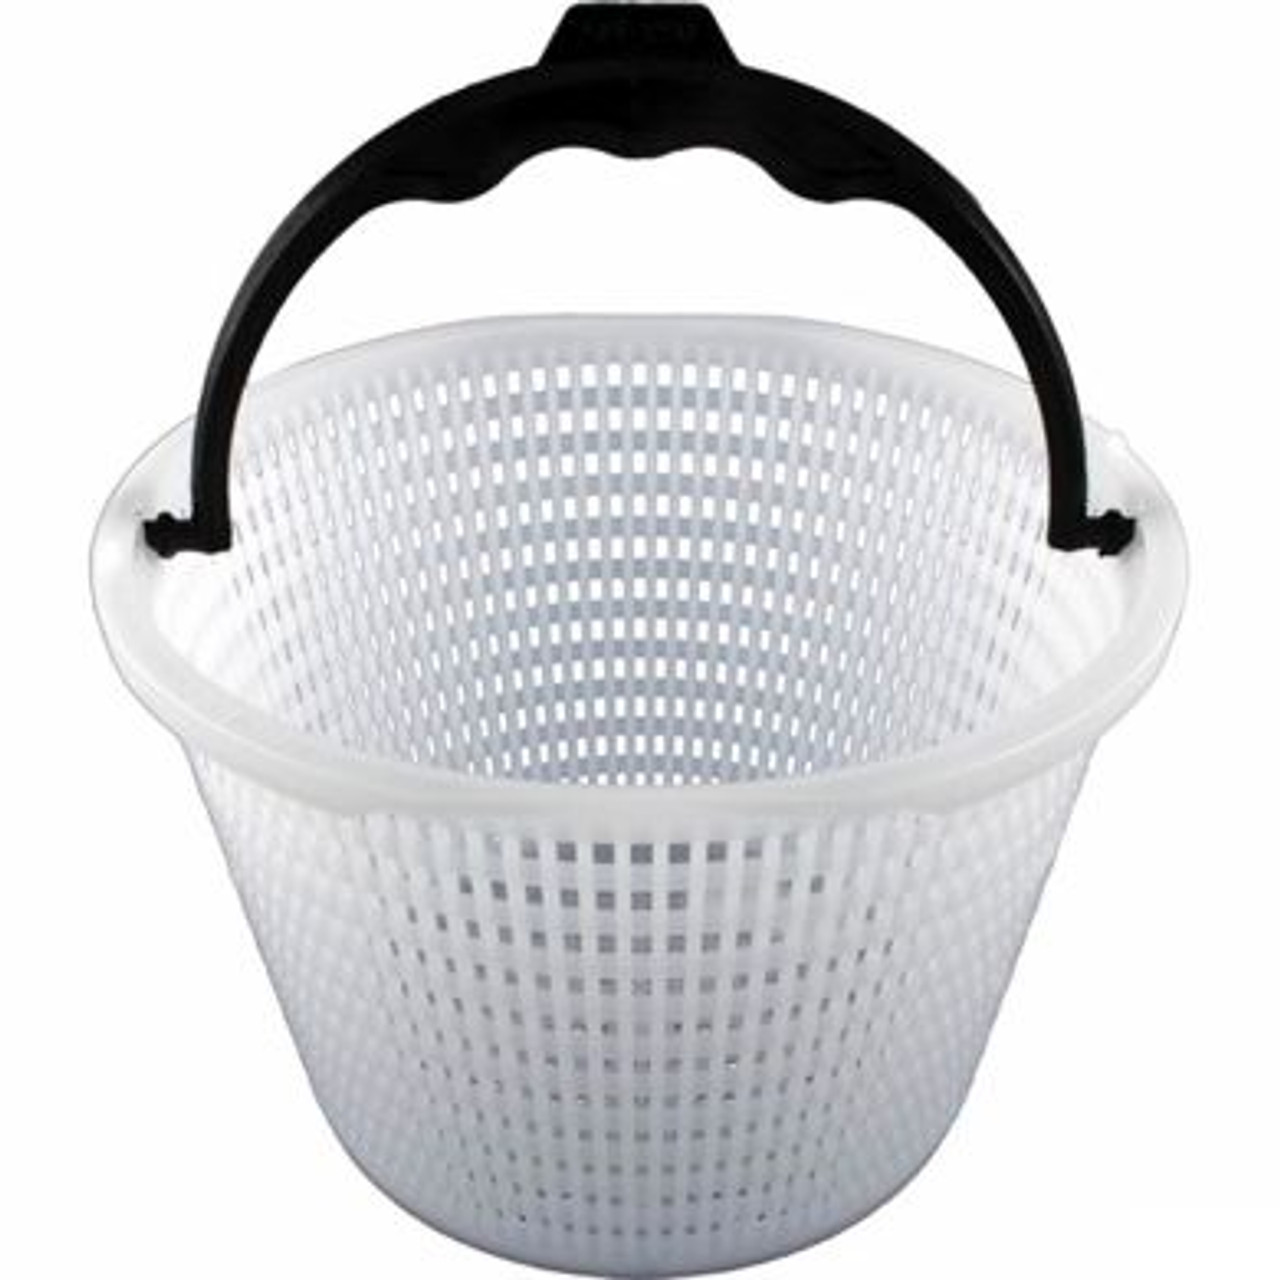 Renegade Skimmer Basket